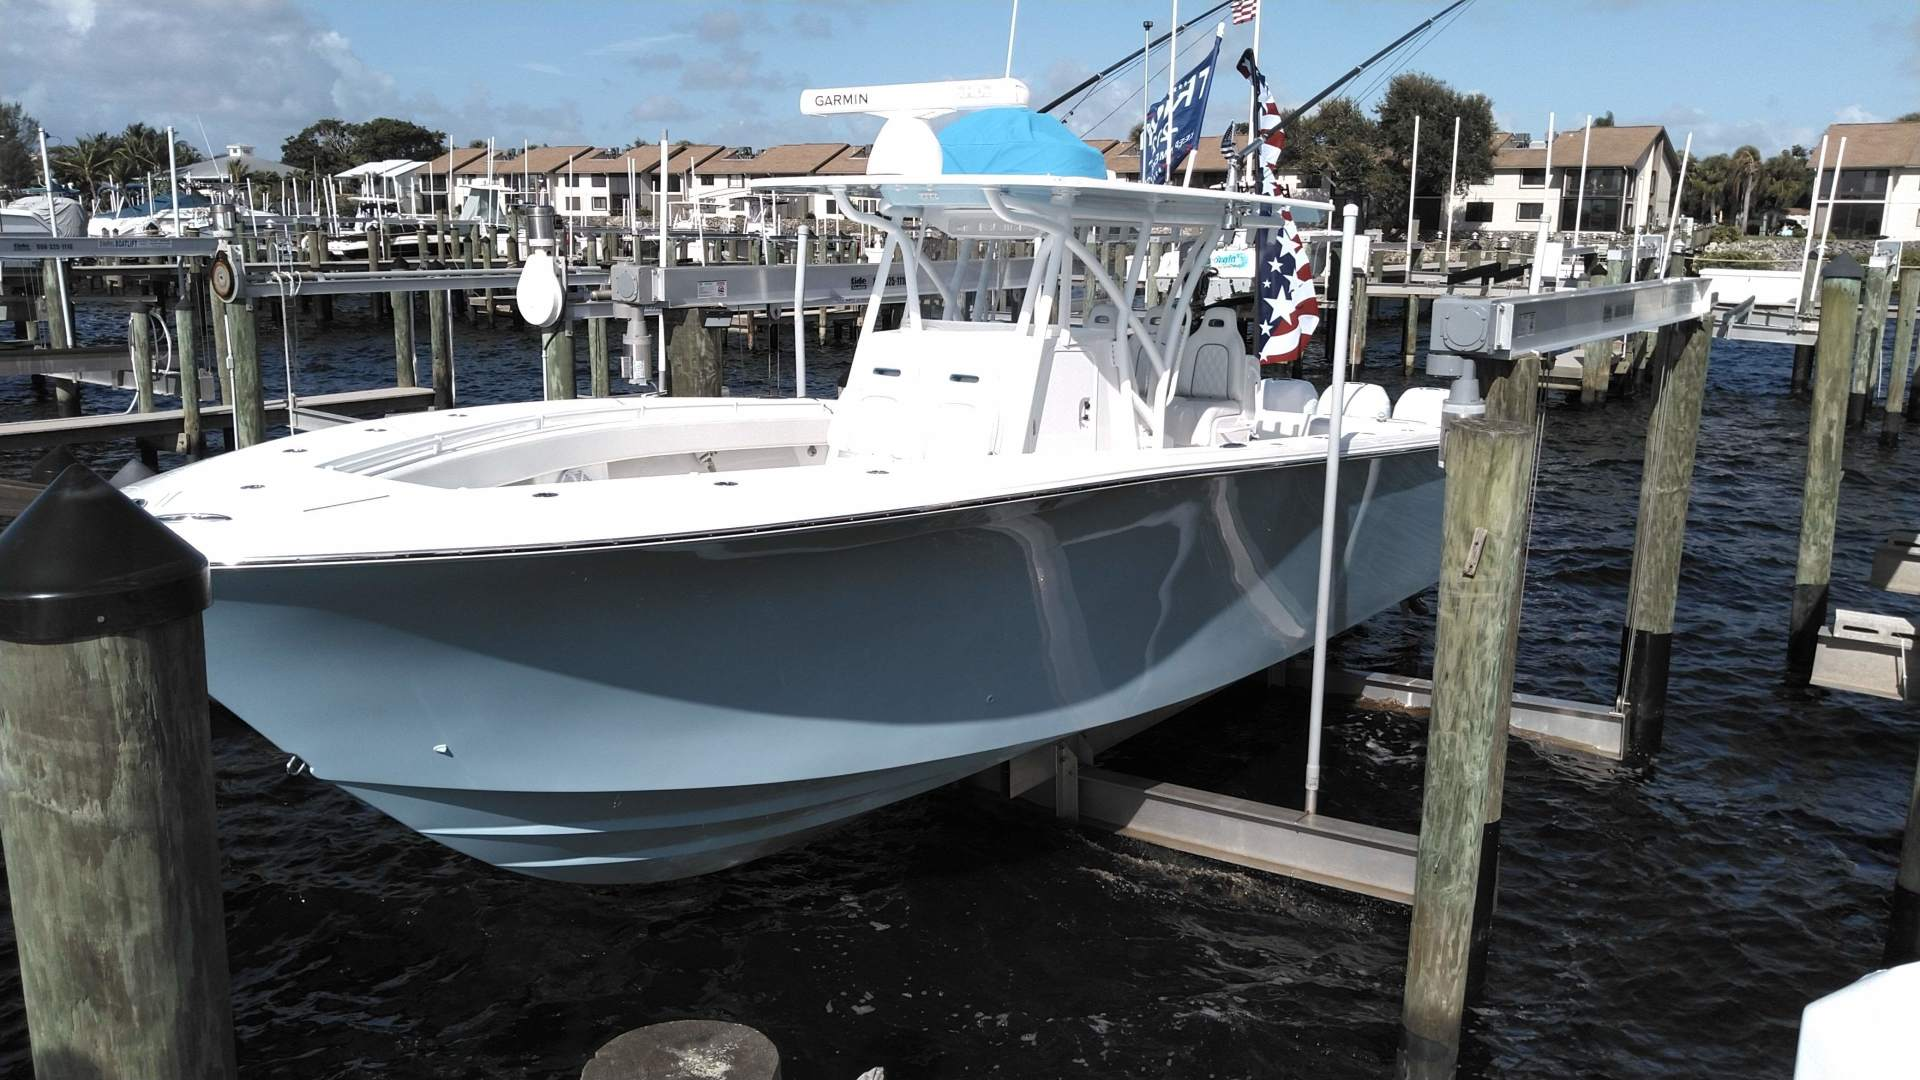 SeaHunter-33 2019 -Jensen Beach-Florida-United States-1562164 | Thumbnail